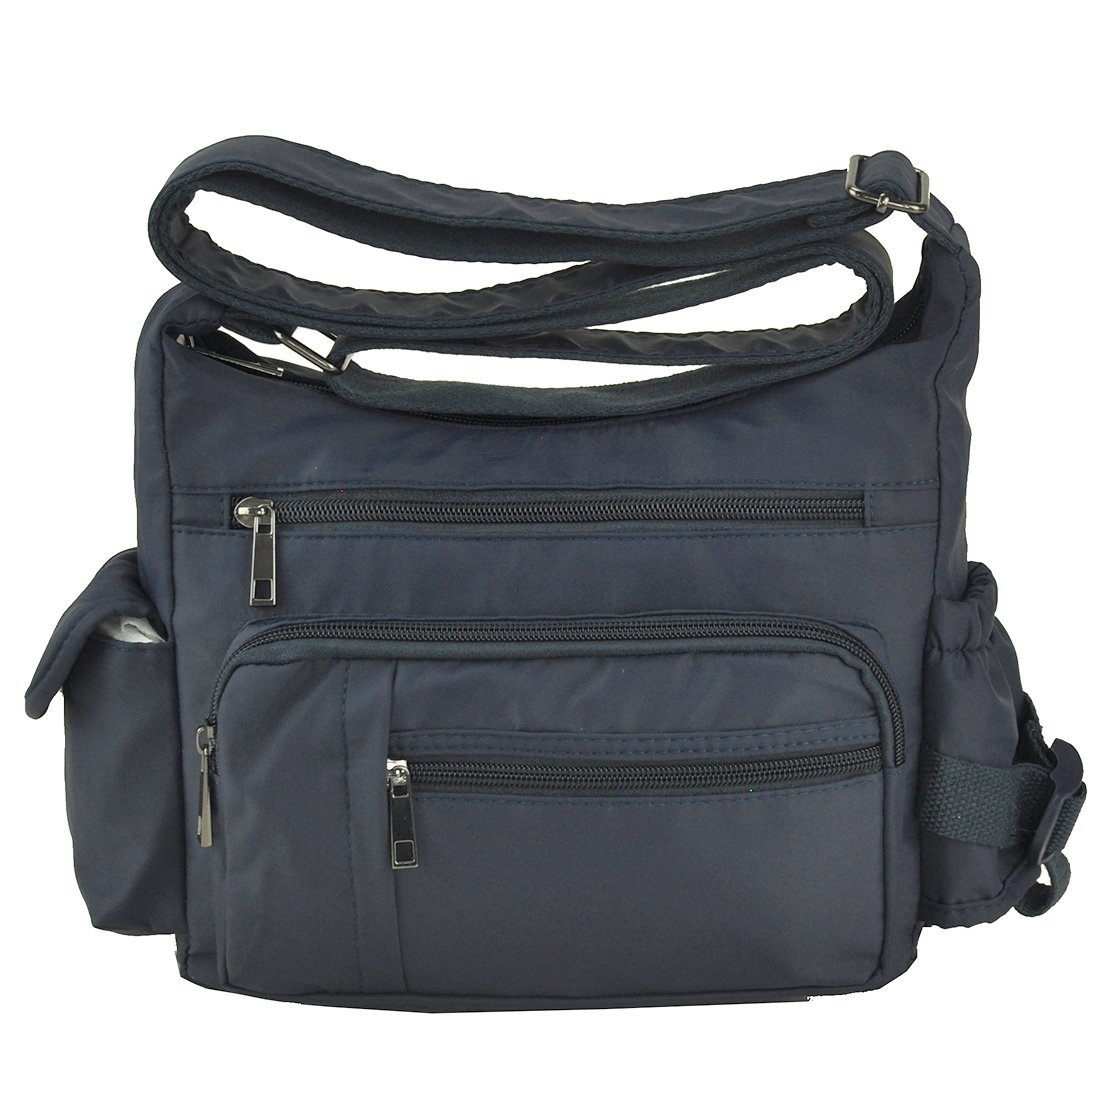 Volcanic Rock Shoulder Bags Messenger Handbags Multi Pocket Waterproof Crossbody Bags(6068-Blue)